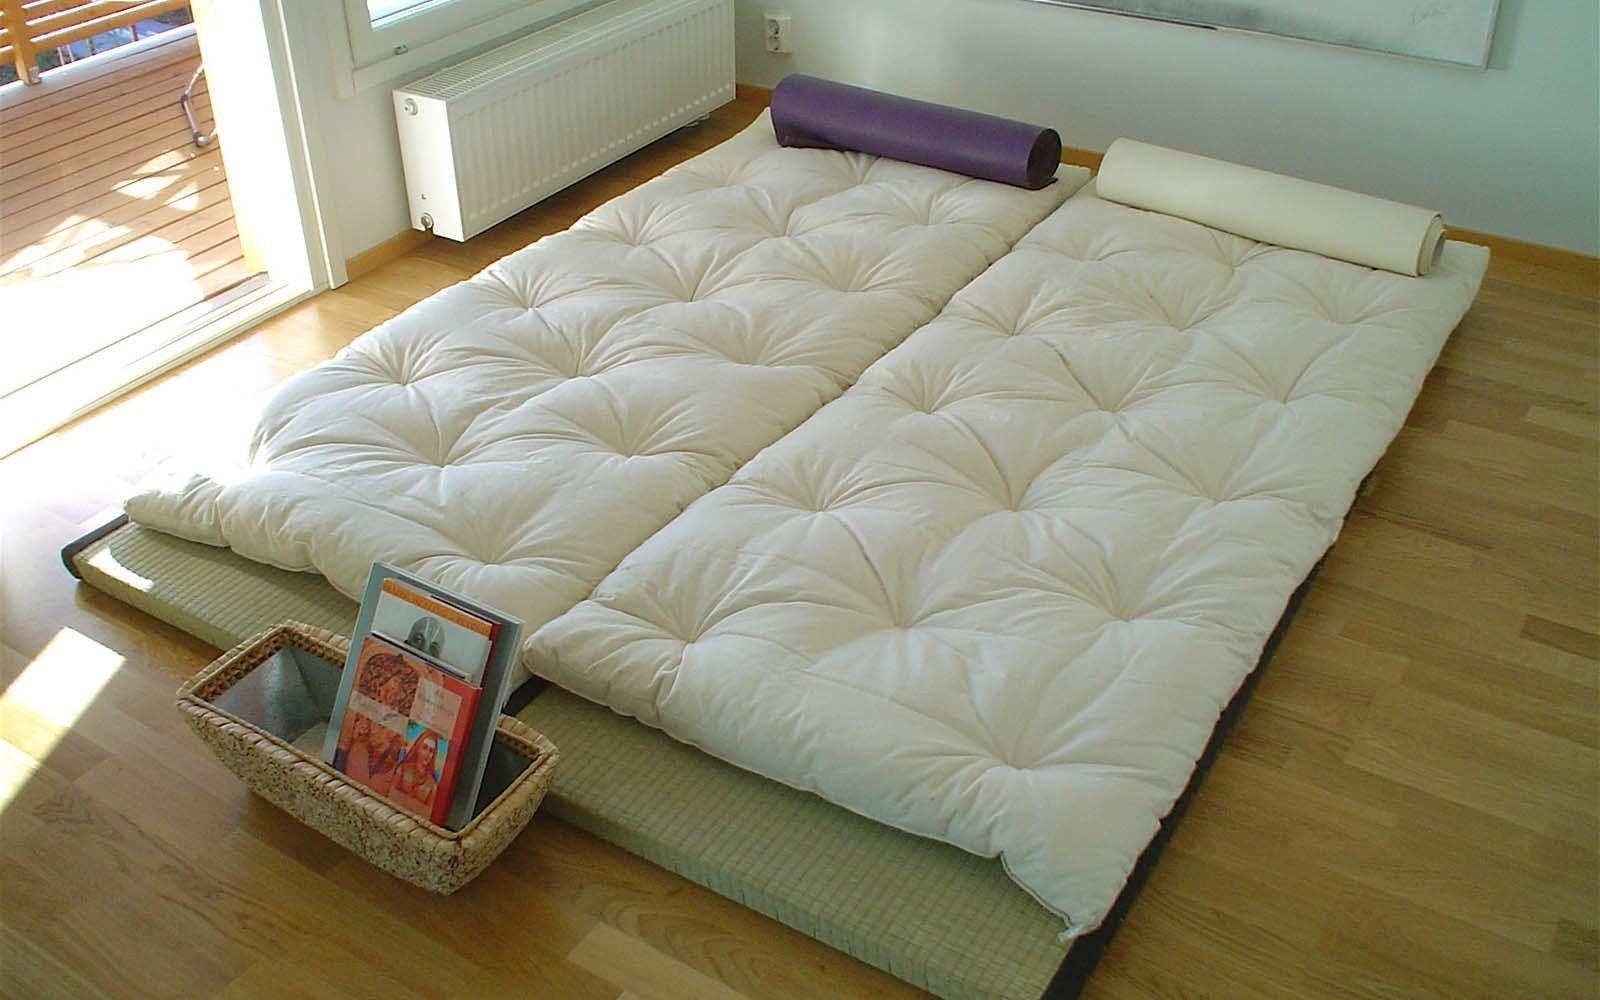 TORANJ Japanese bedroom, Asian home decor, Japanese mattress